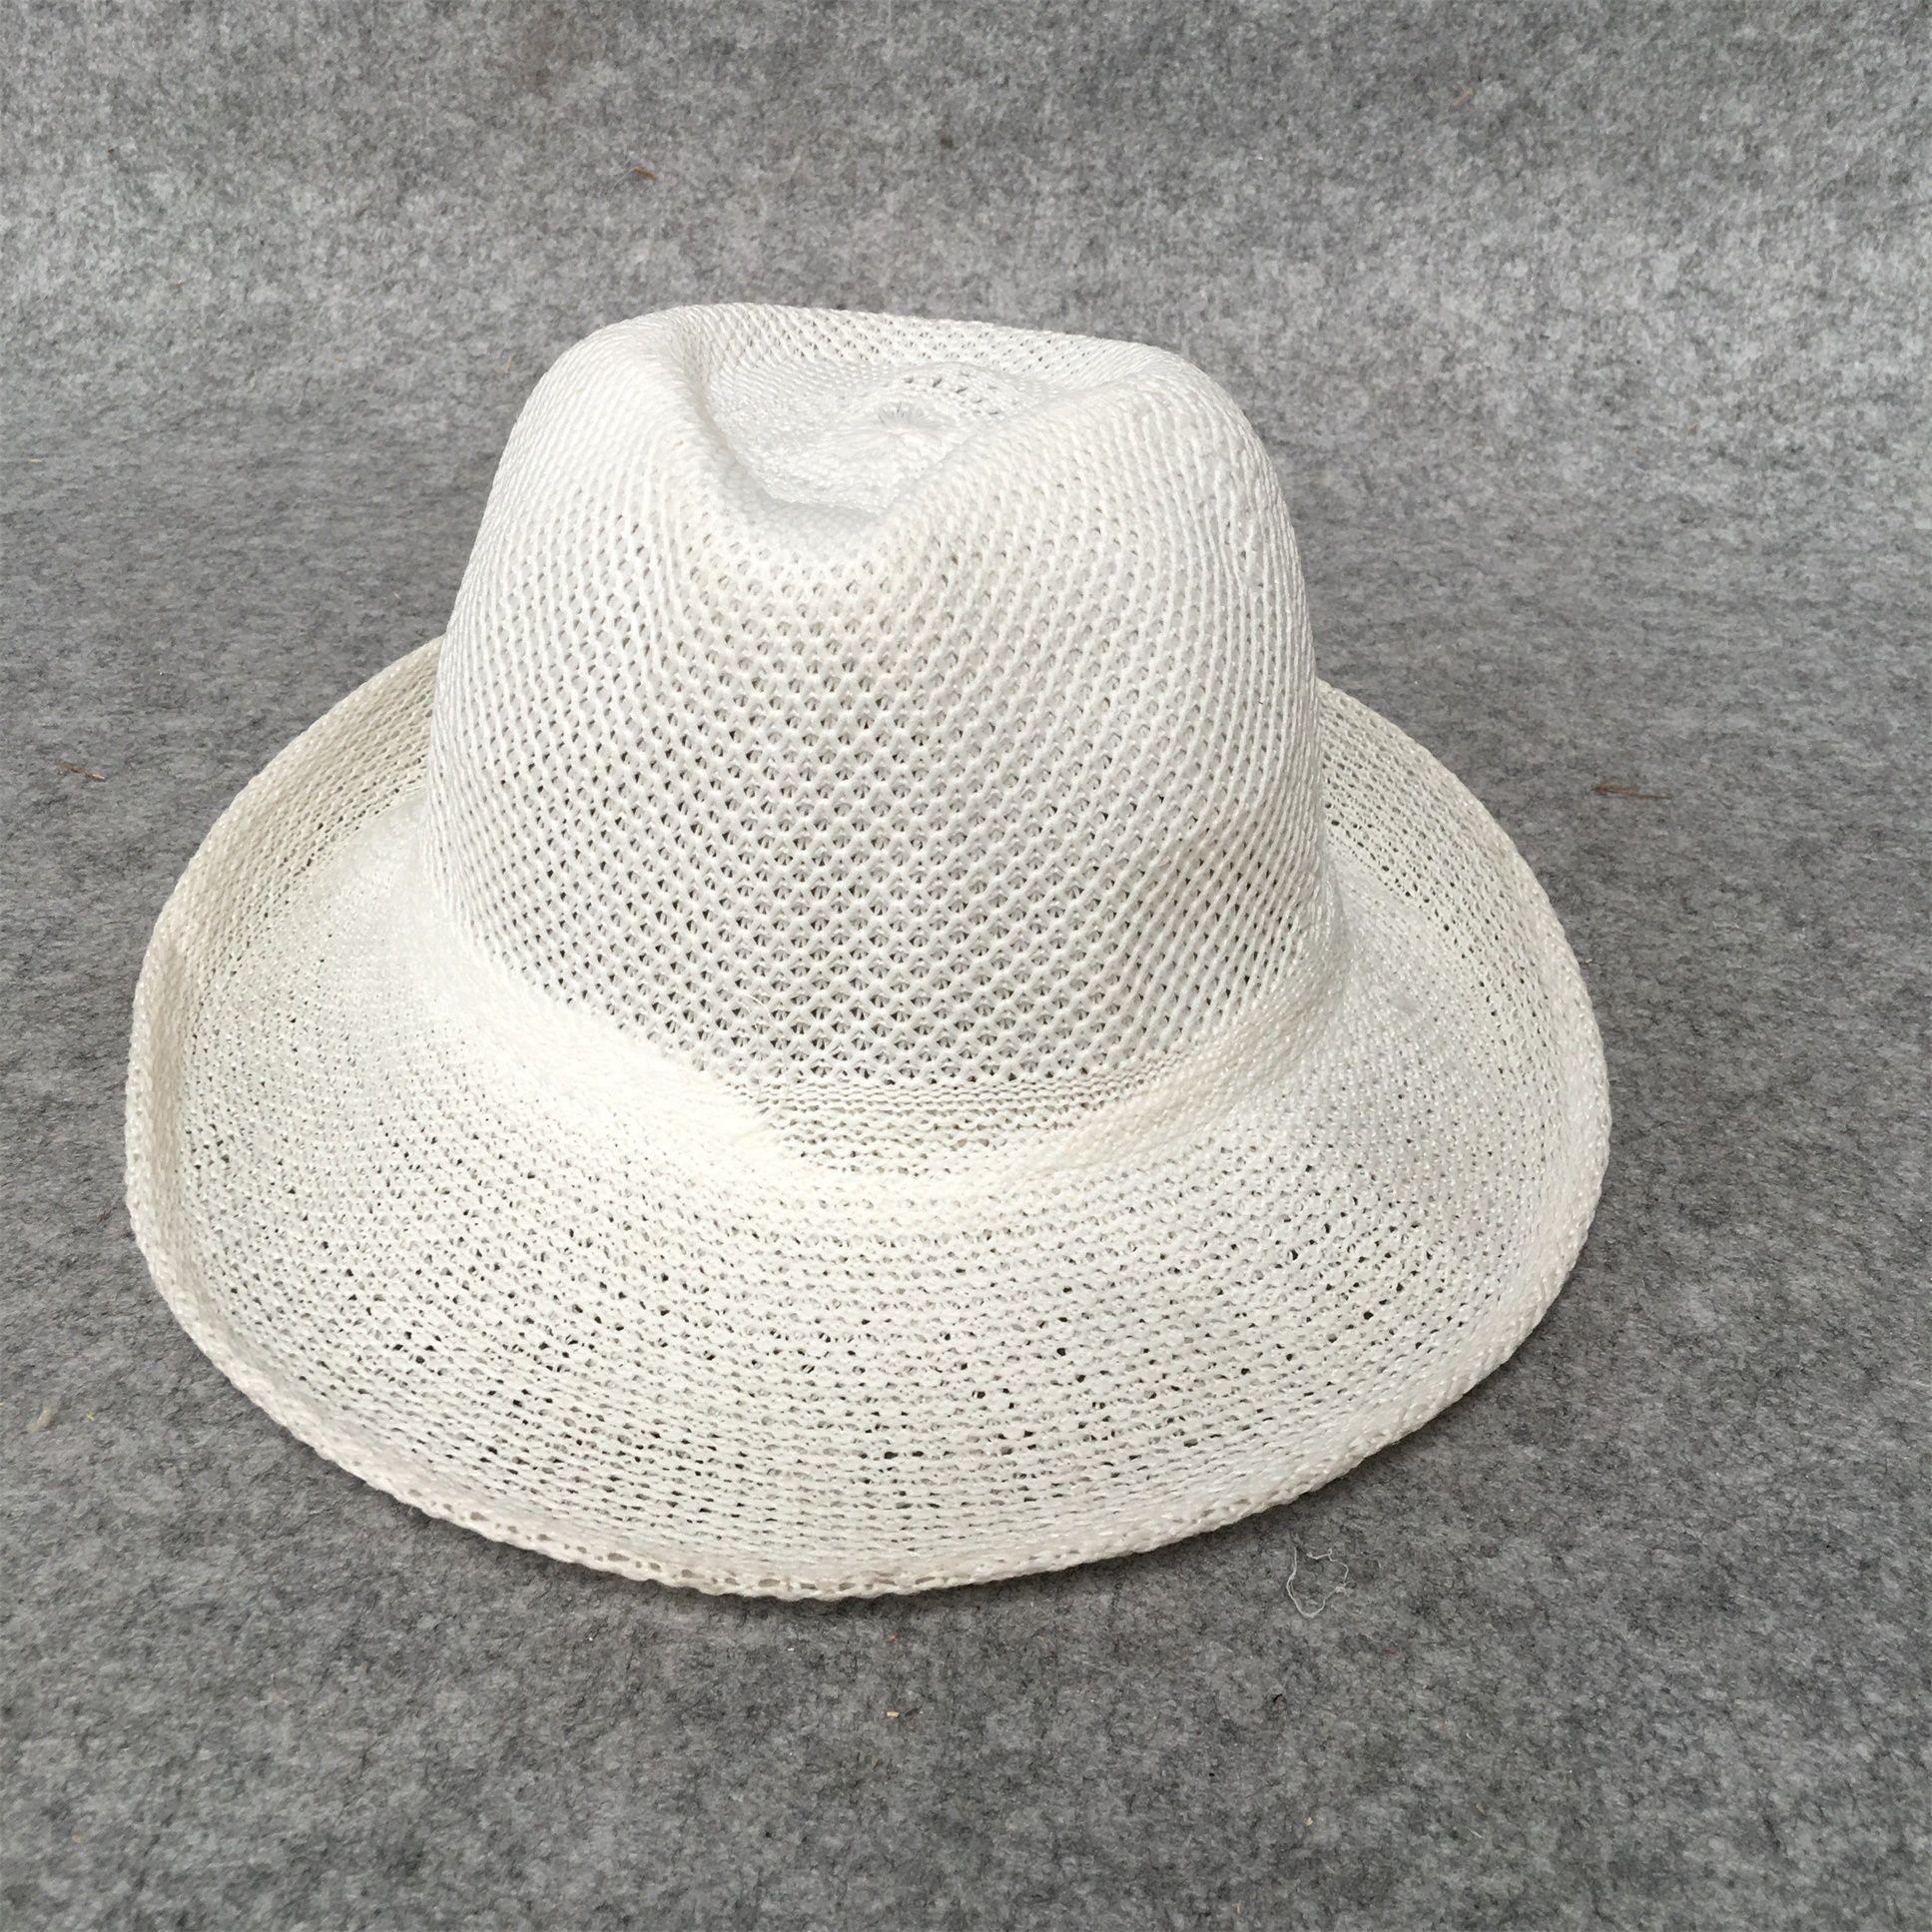 Großhandel Customization Logo Gedruckt Häkeln Sommer Bulk Cowboyhüte